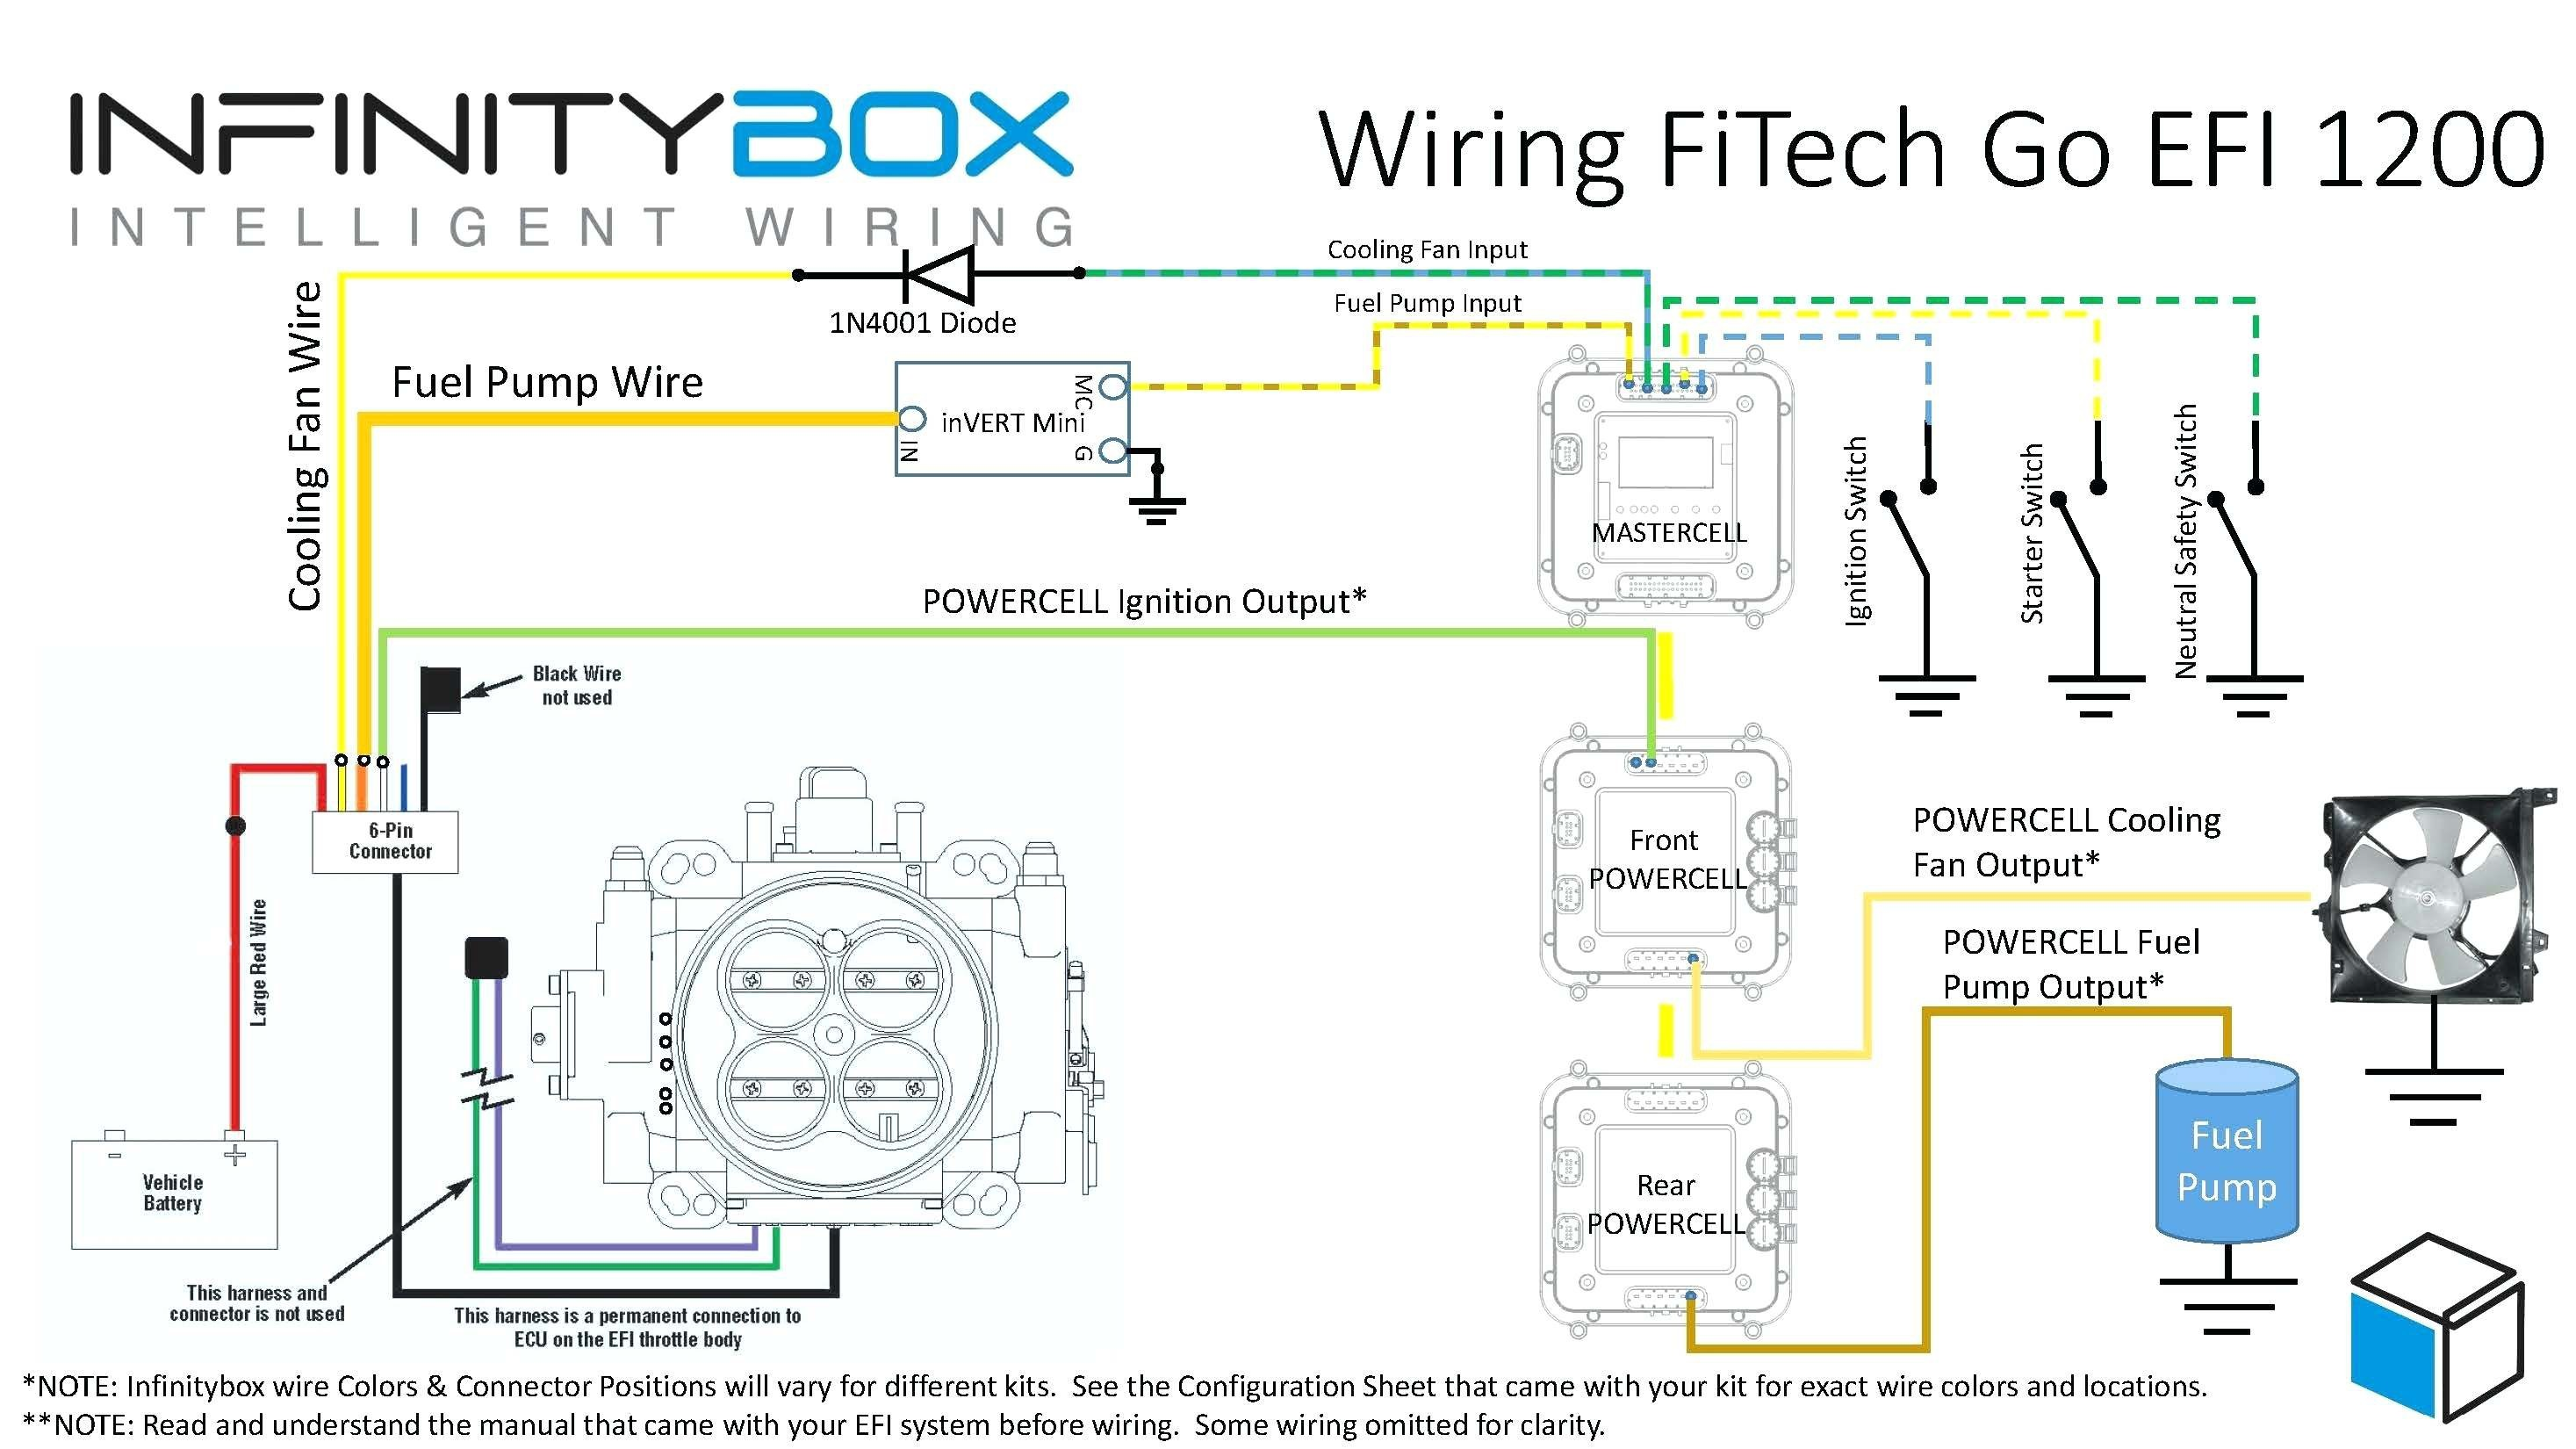 4 Prong Twist Lock Plug Wiring Diagram Luxury Vintage Air Wiring Diagram Conditioning Inventors Performance